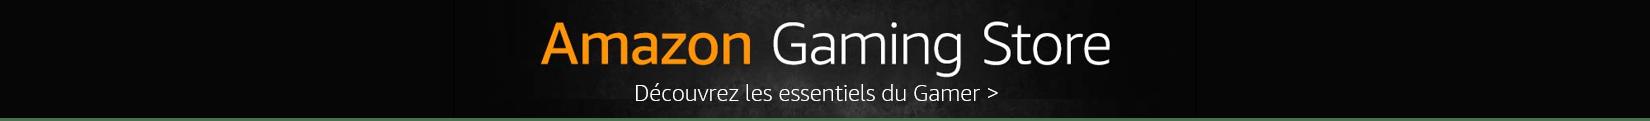 Amazon Gaming Store